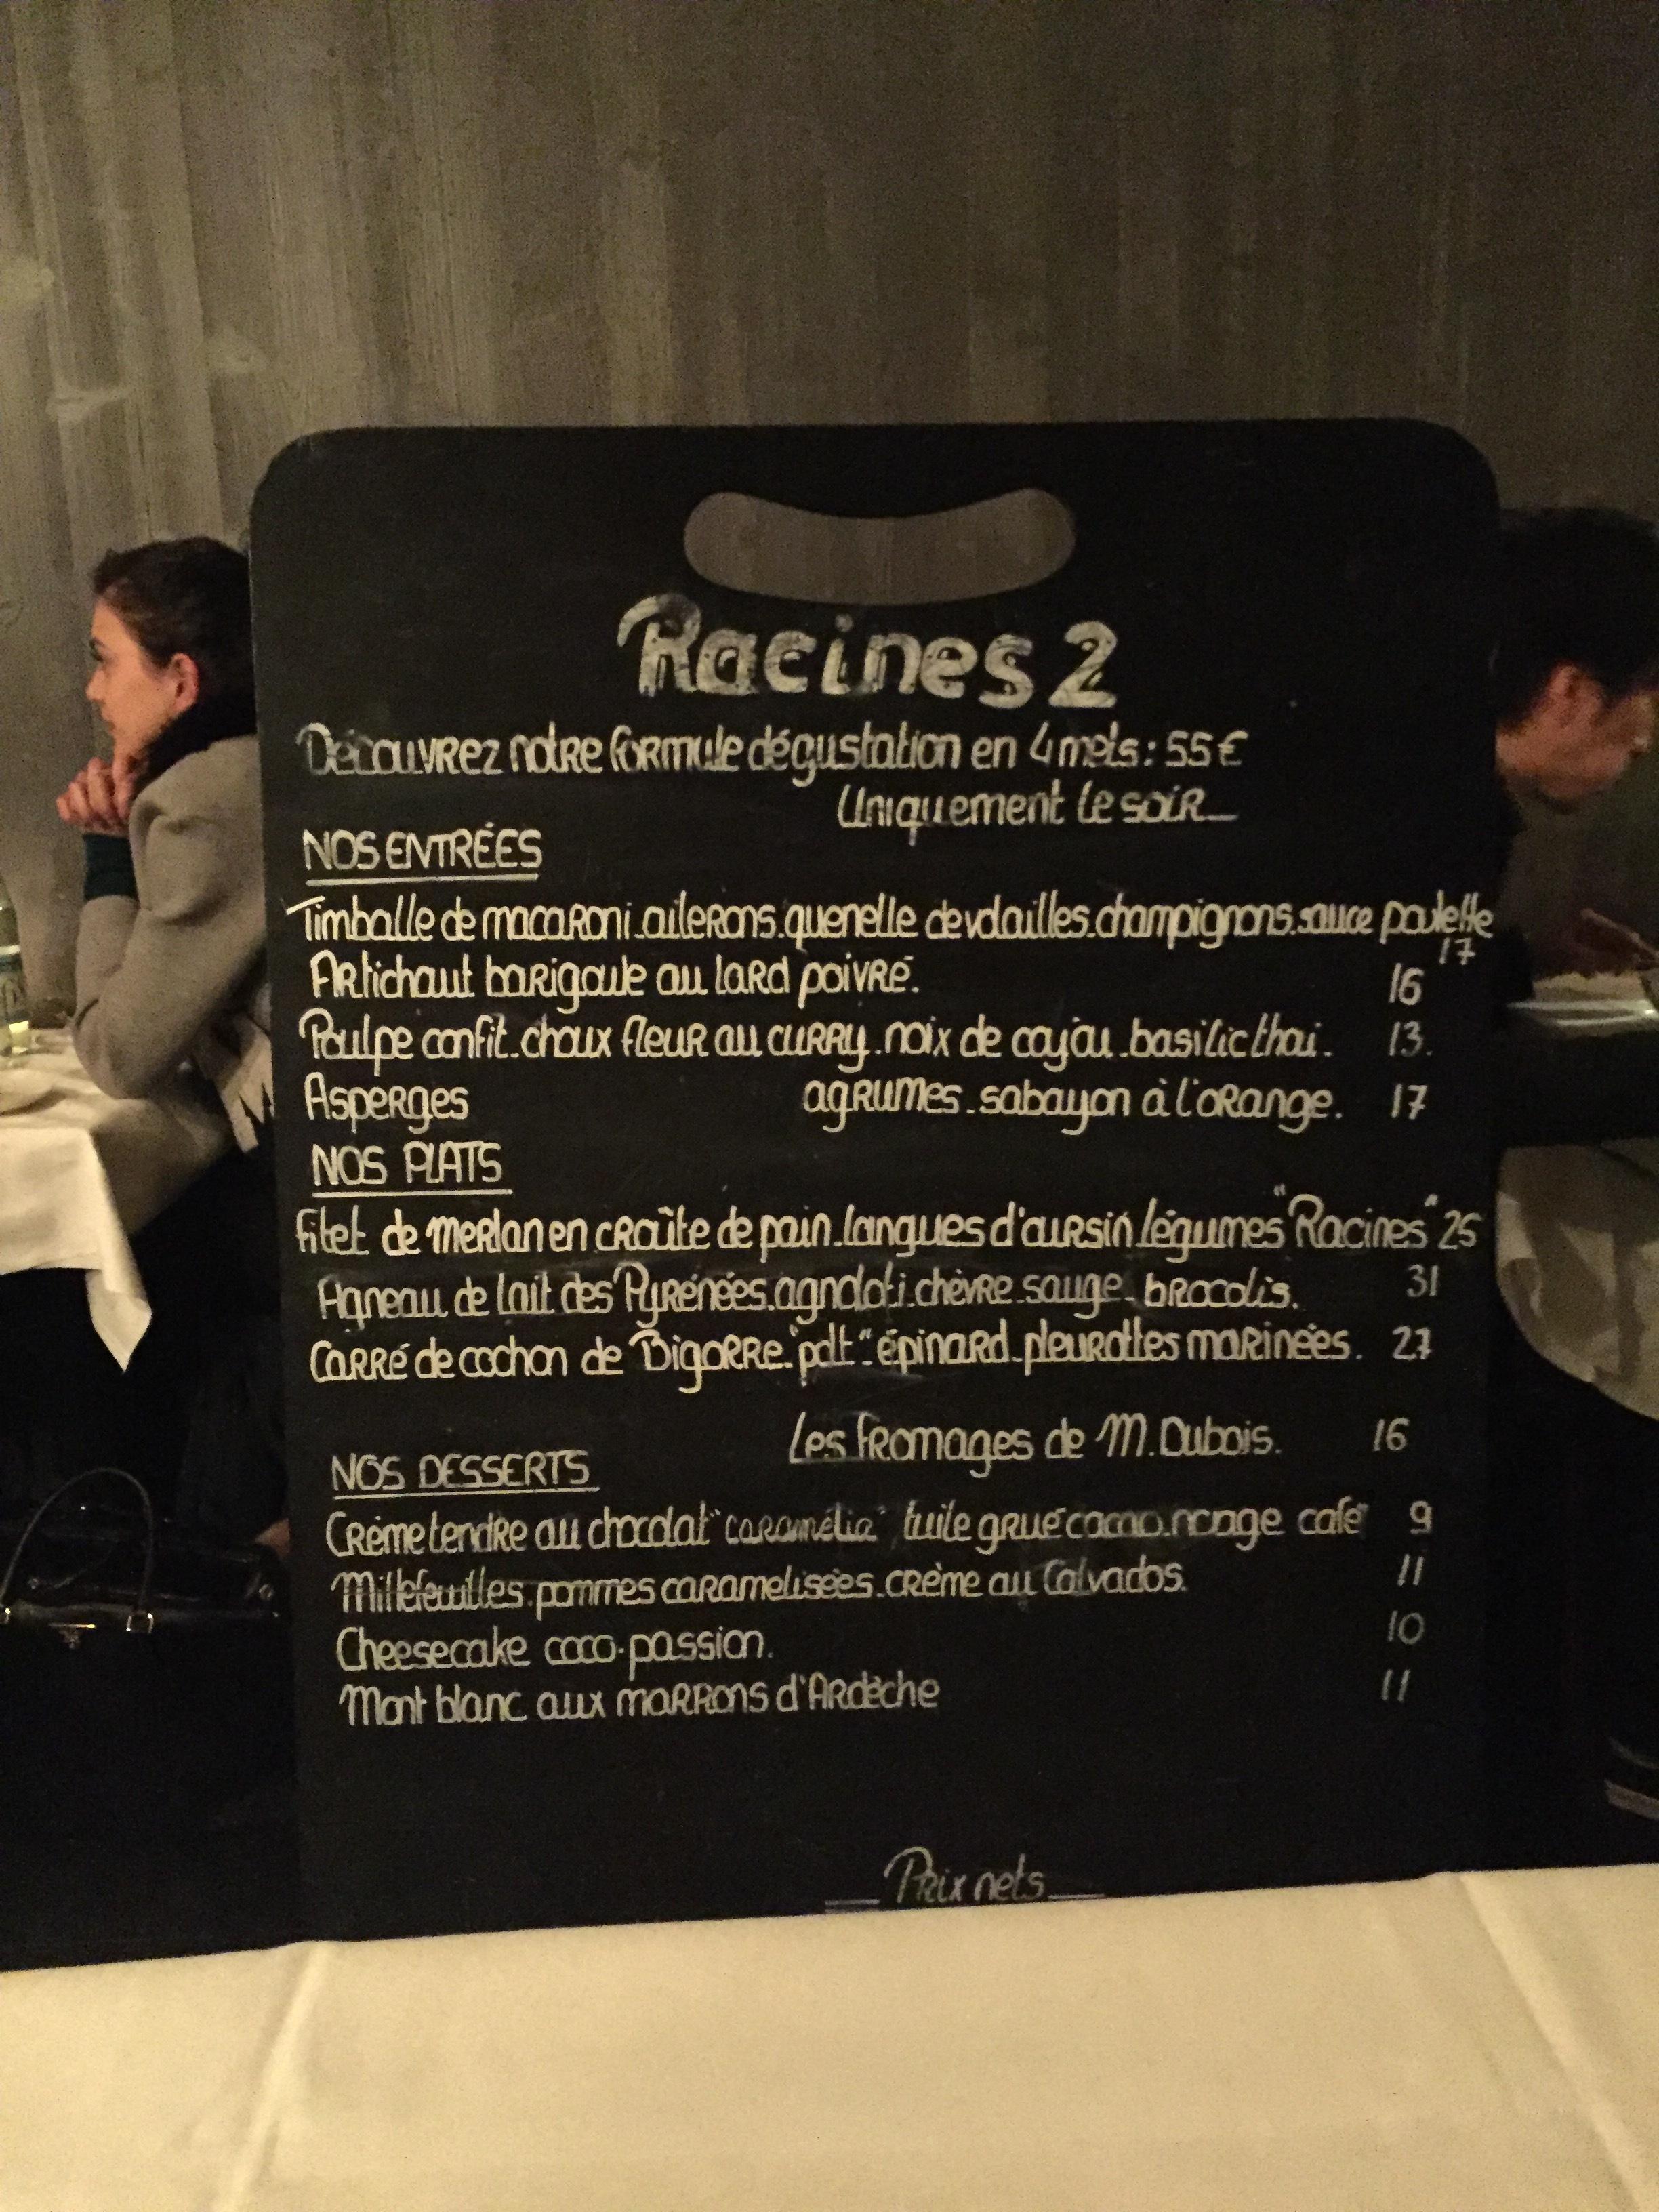 Racines2 menu board